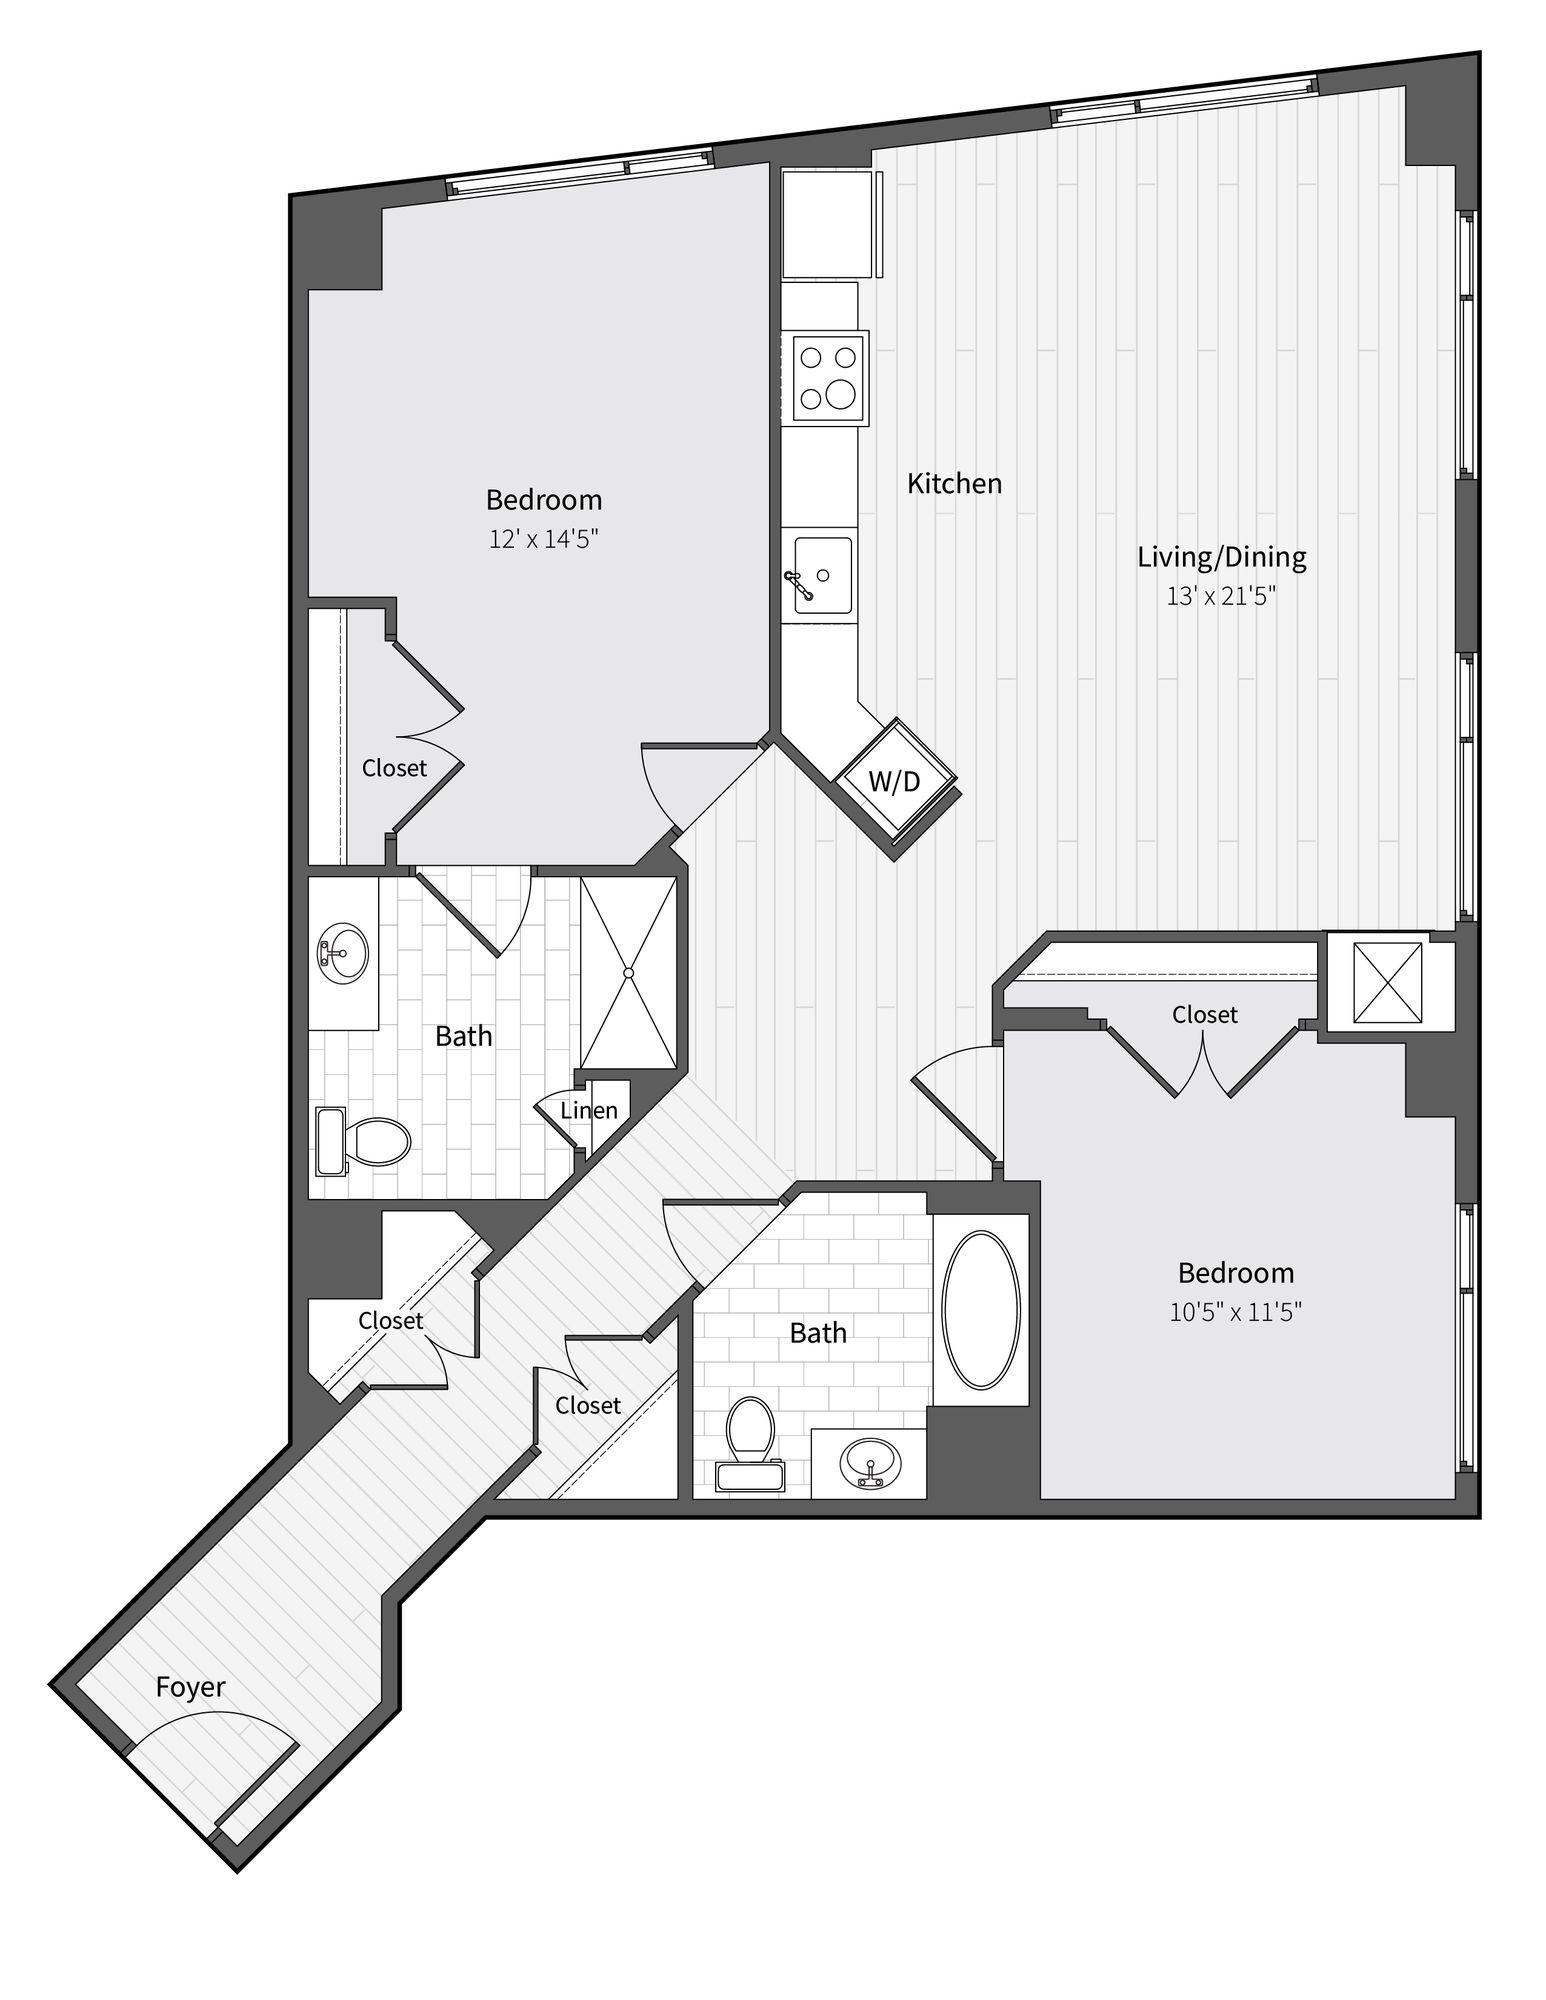 Apartment 450 floorplan